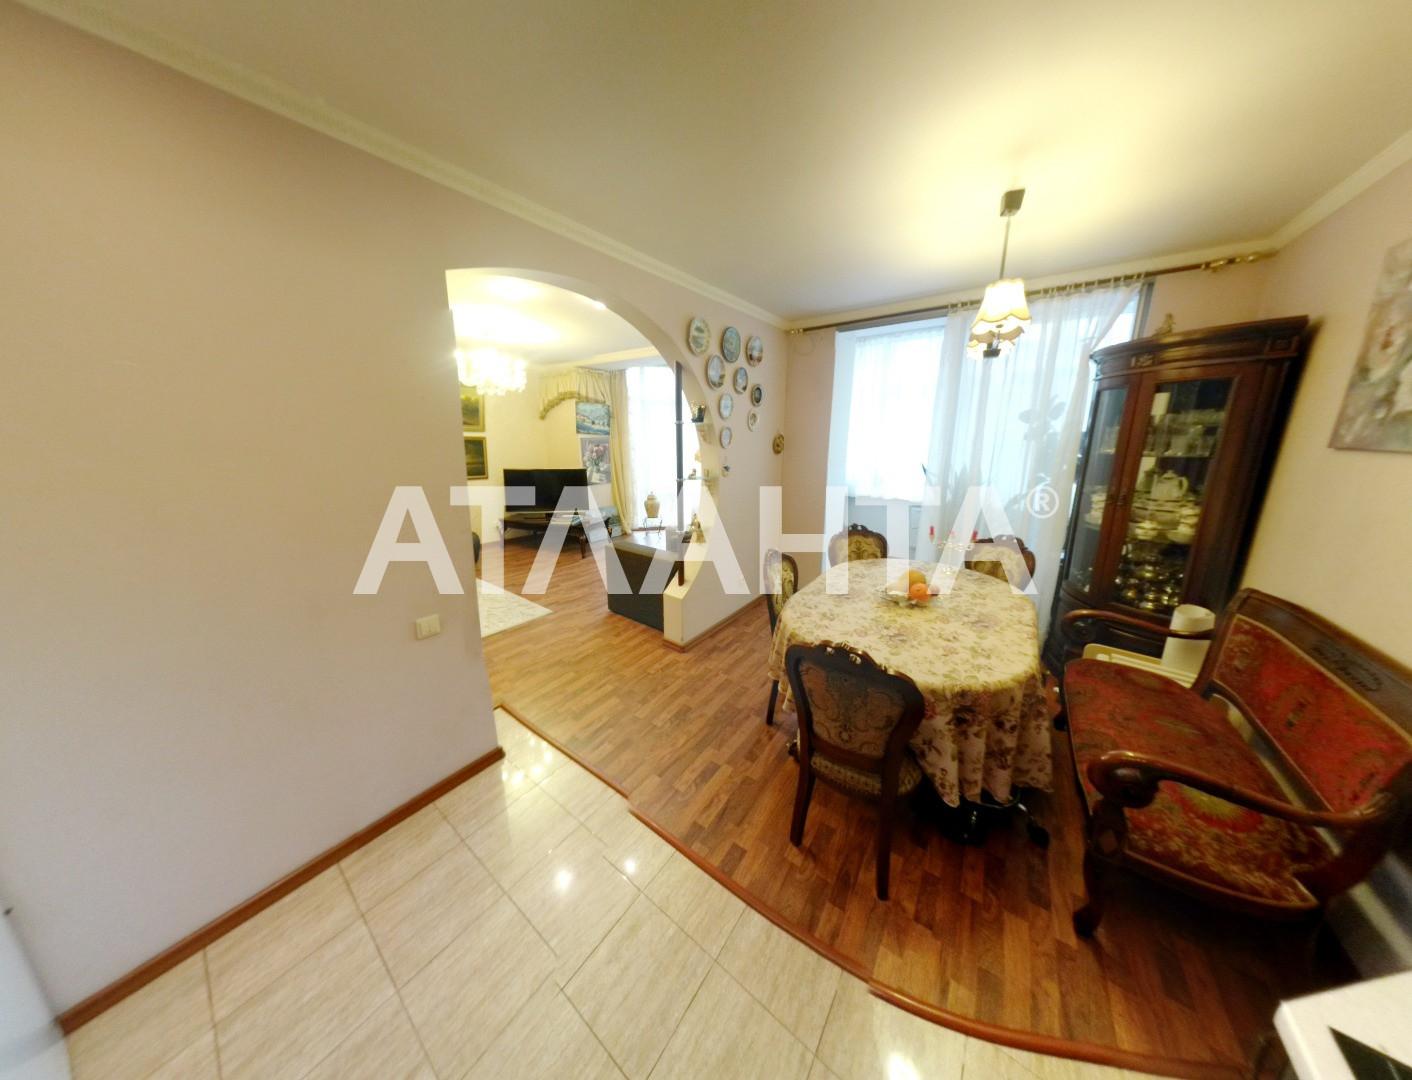 Продается 3-комнатная Квартира на ул. Ул. Ломоносова — 139 600 у.е. (фото №10)